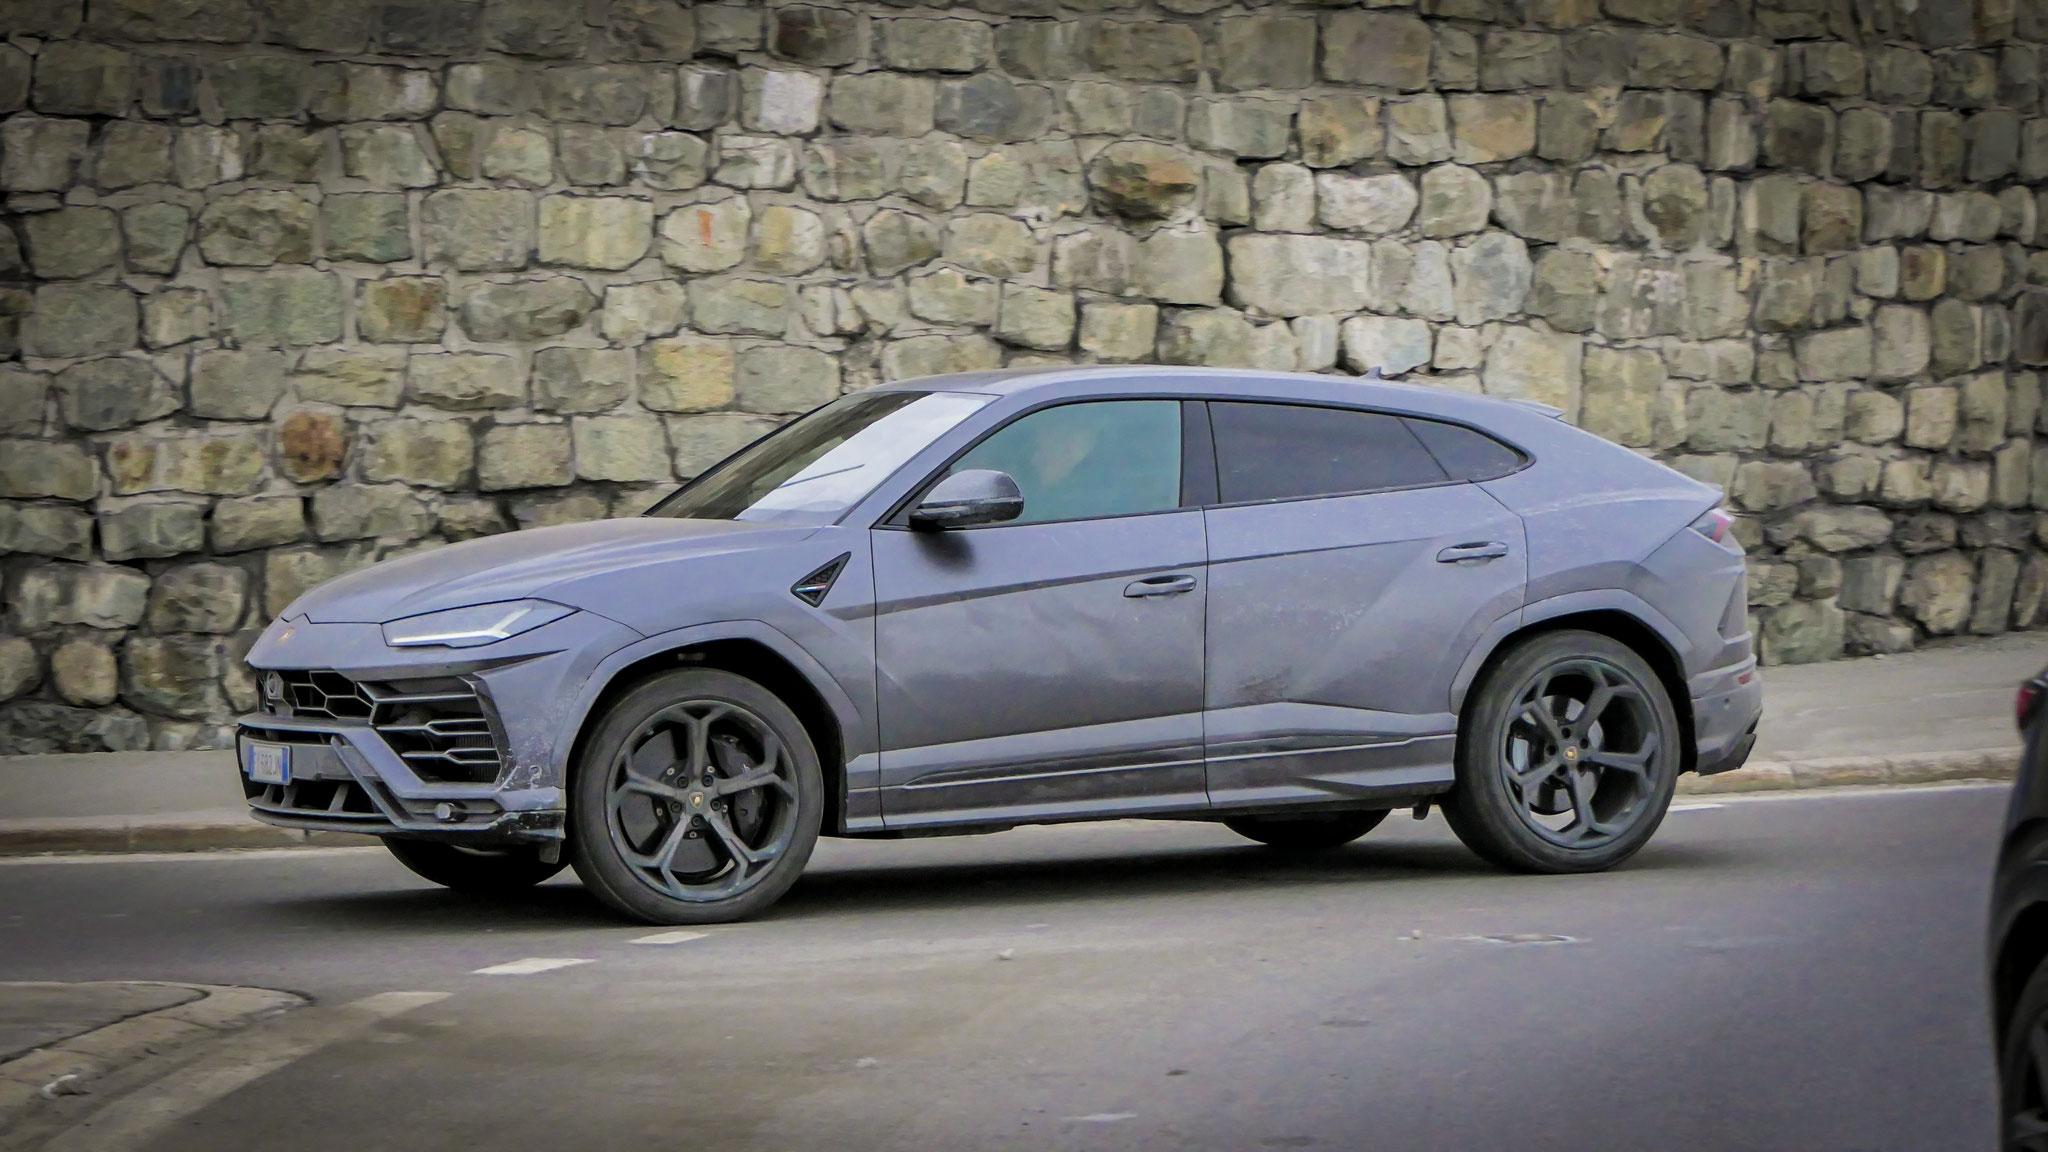 Lamborghini Urus - FY-682-JN (ITA)